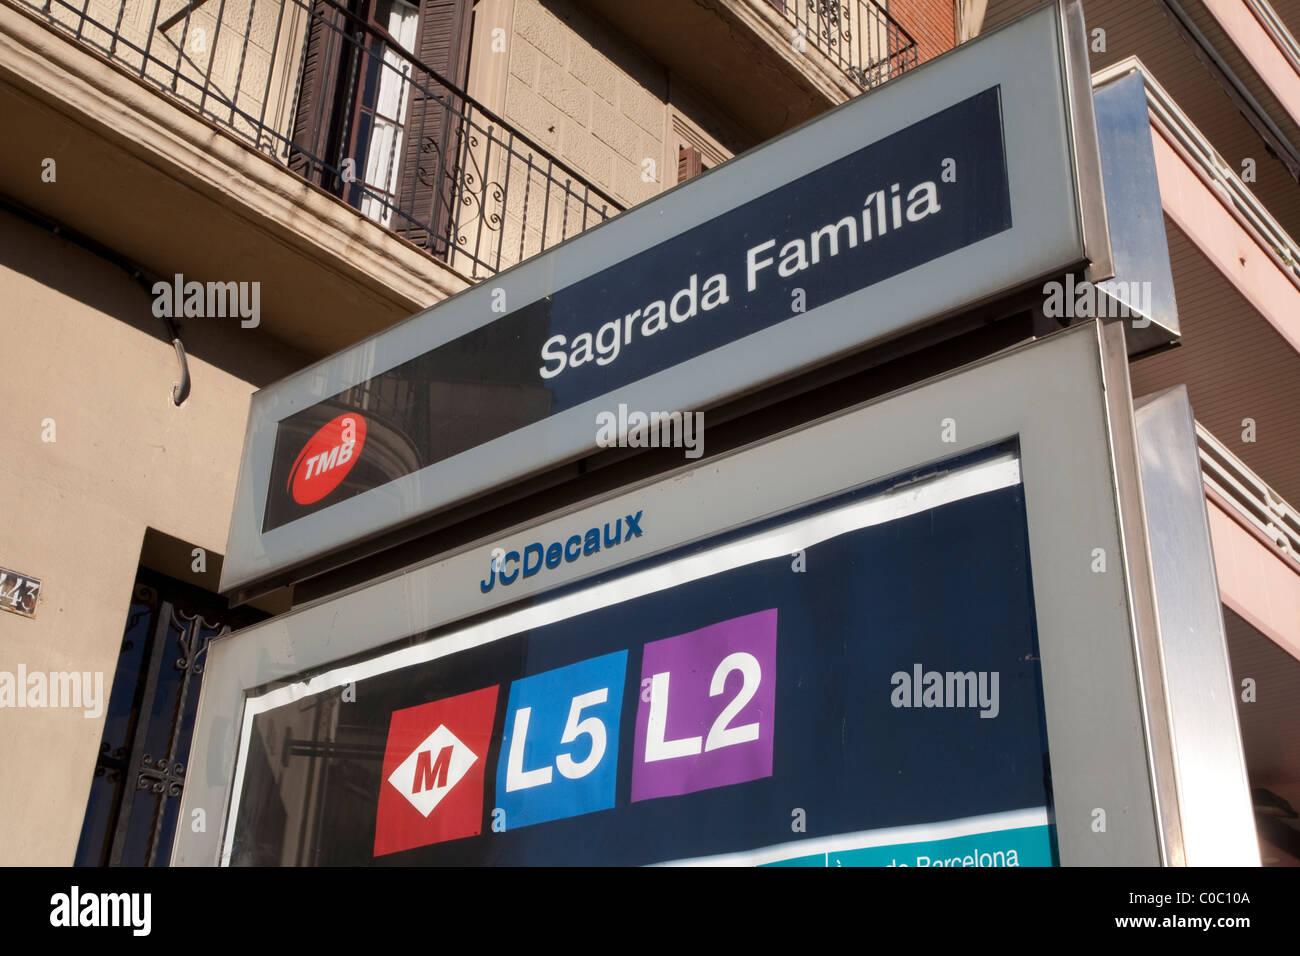 Sagrada Familia Subway Station Metro Sign in Barcelona, Catalonia, Spain - Stock Image